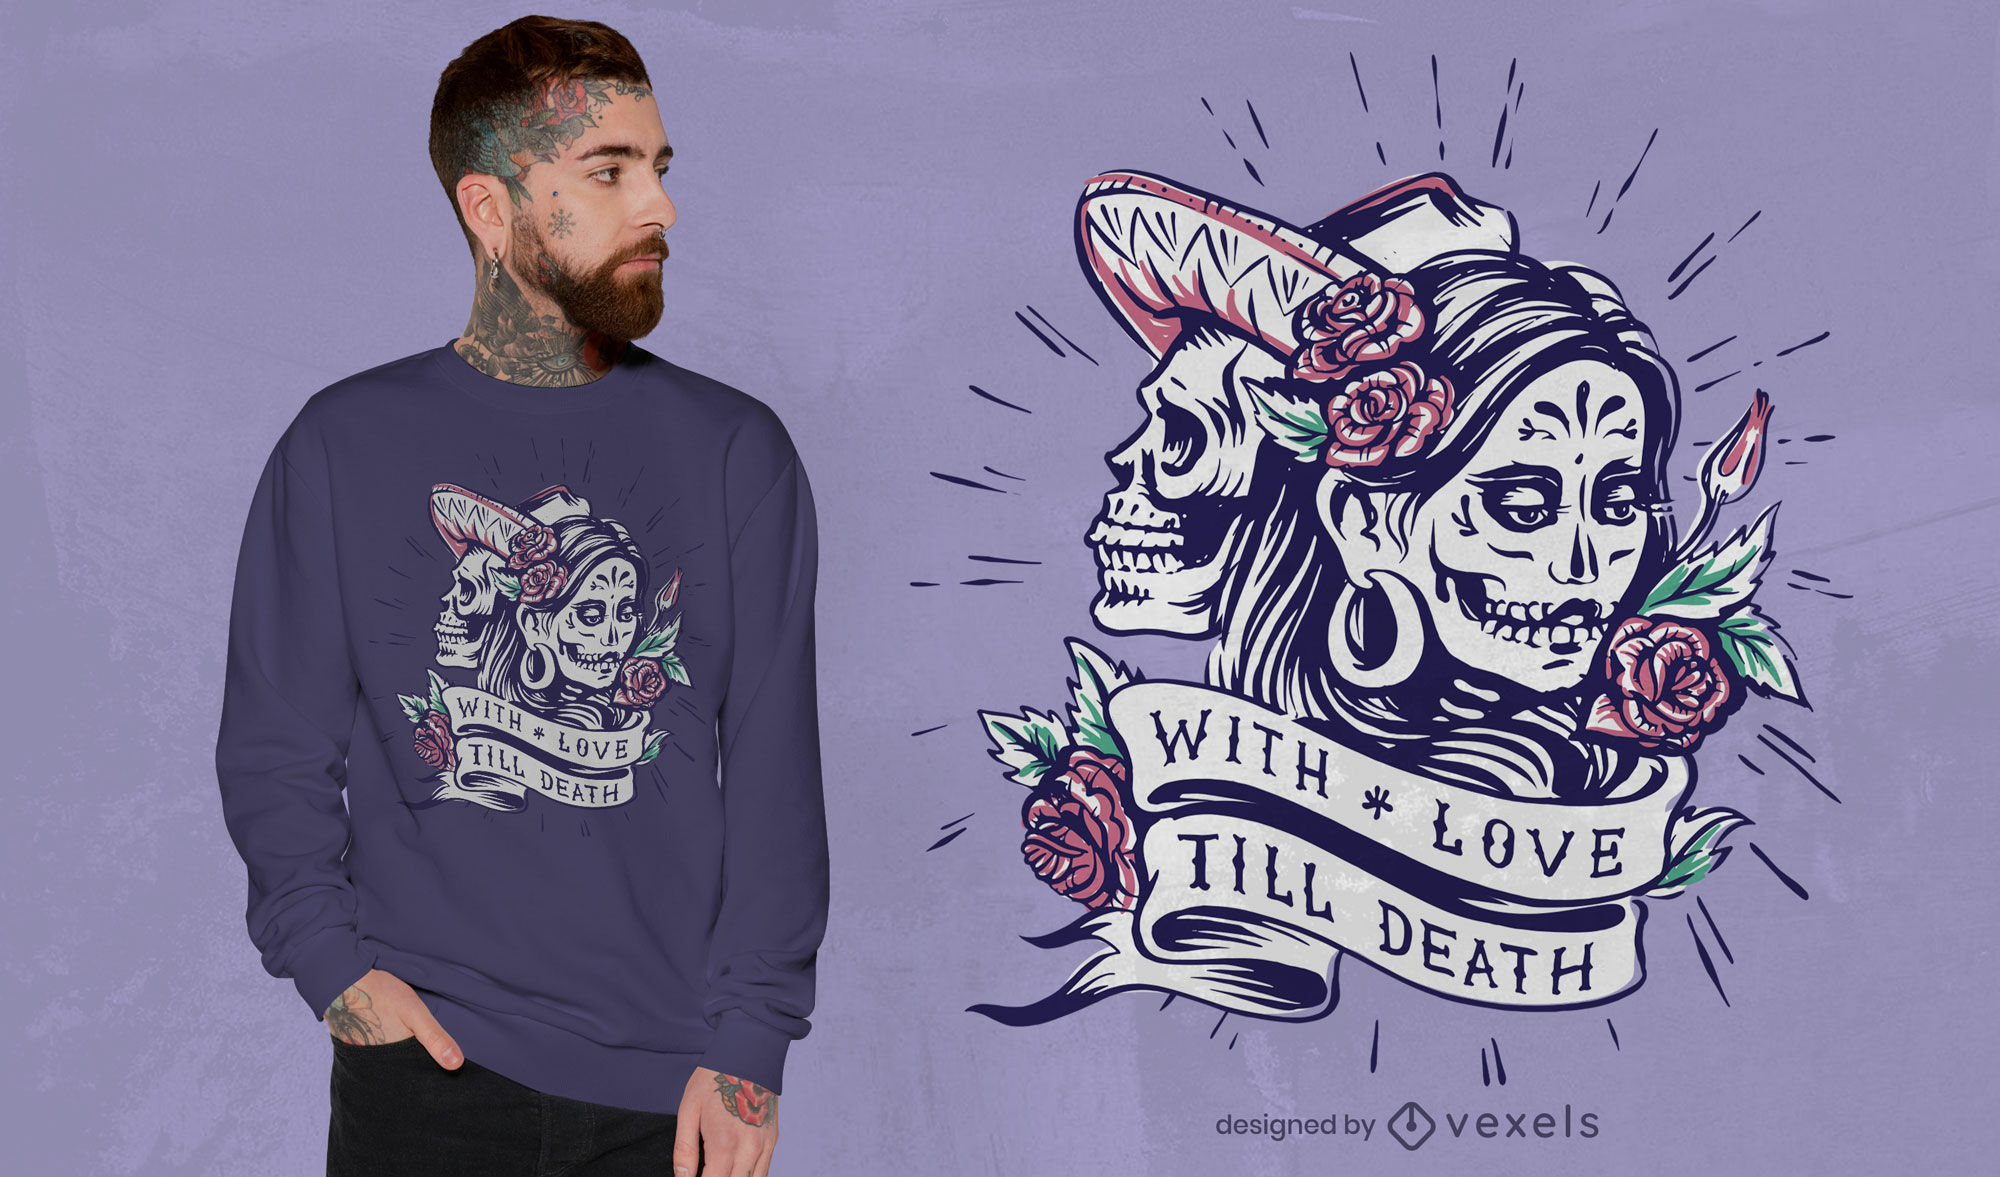 Dise?o de camiseta de amor del d?a de los muertos.